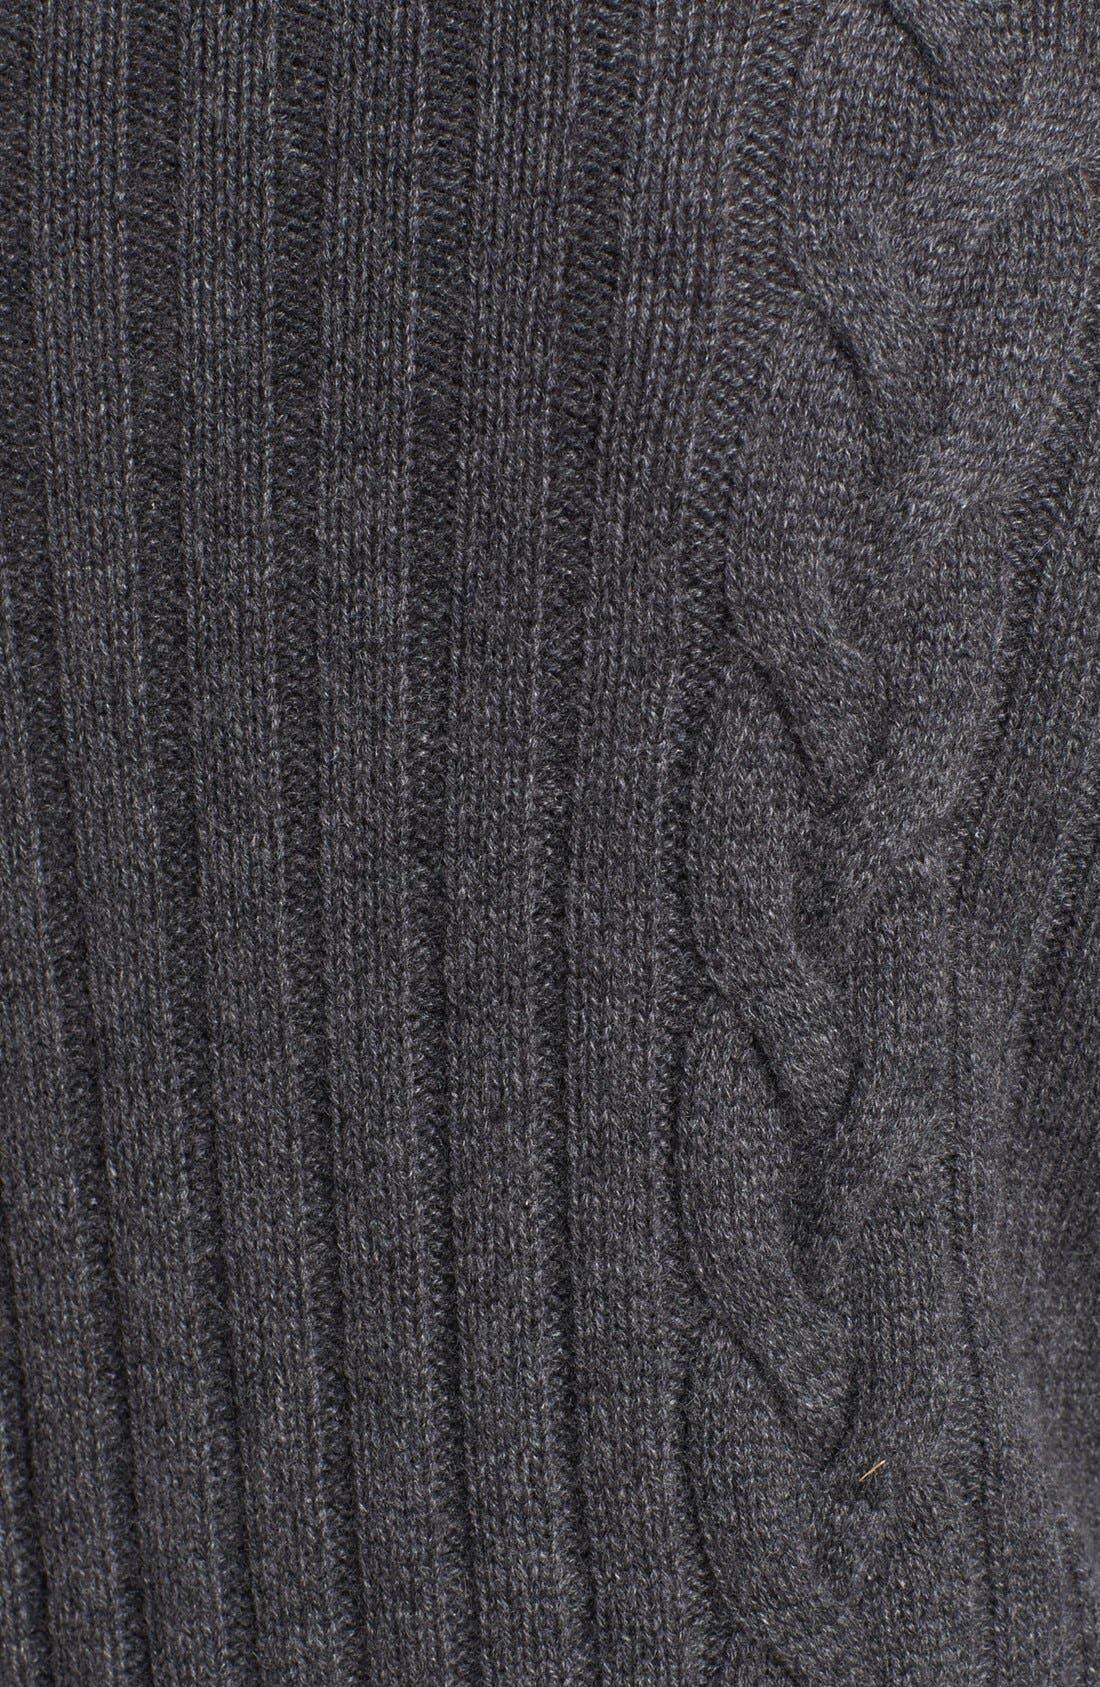 Alternate Image 3  - Robert Talbott Chunky Cable Cashmere Cardigan